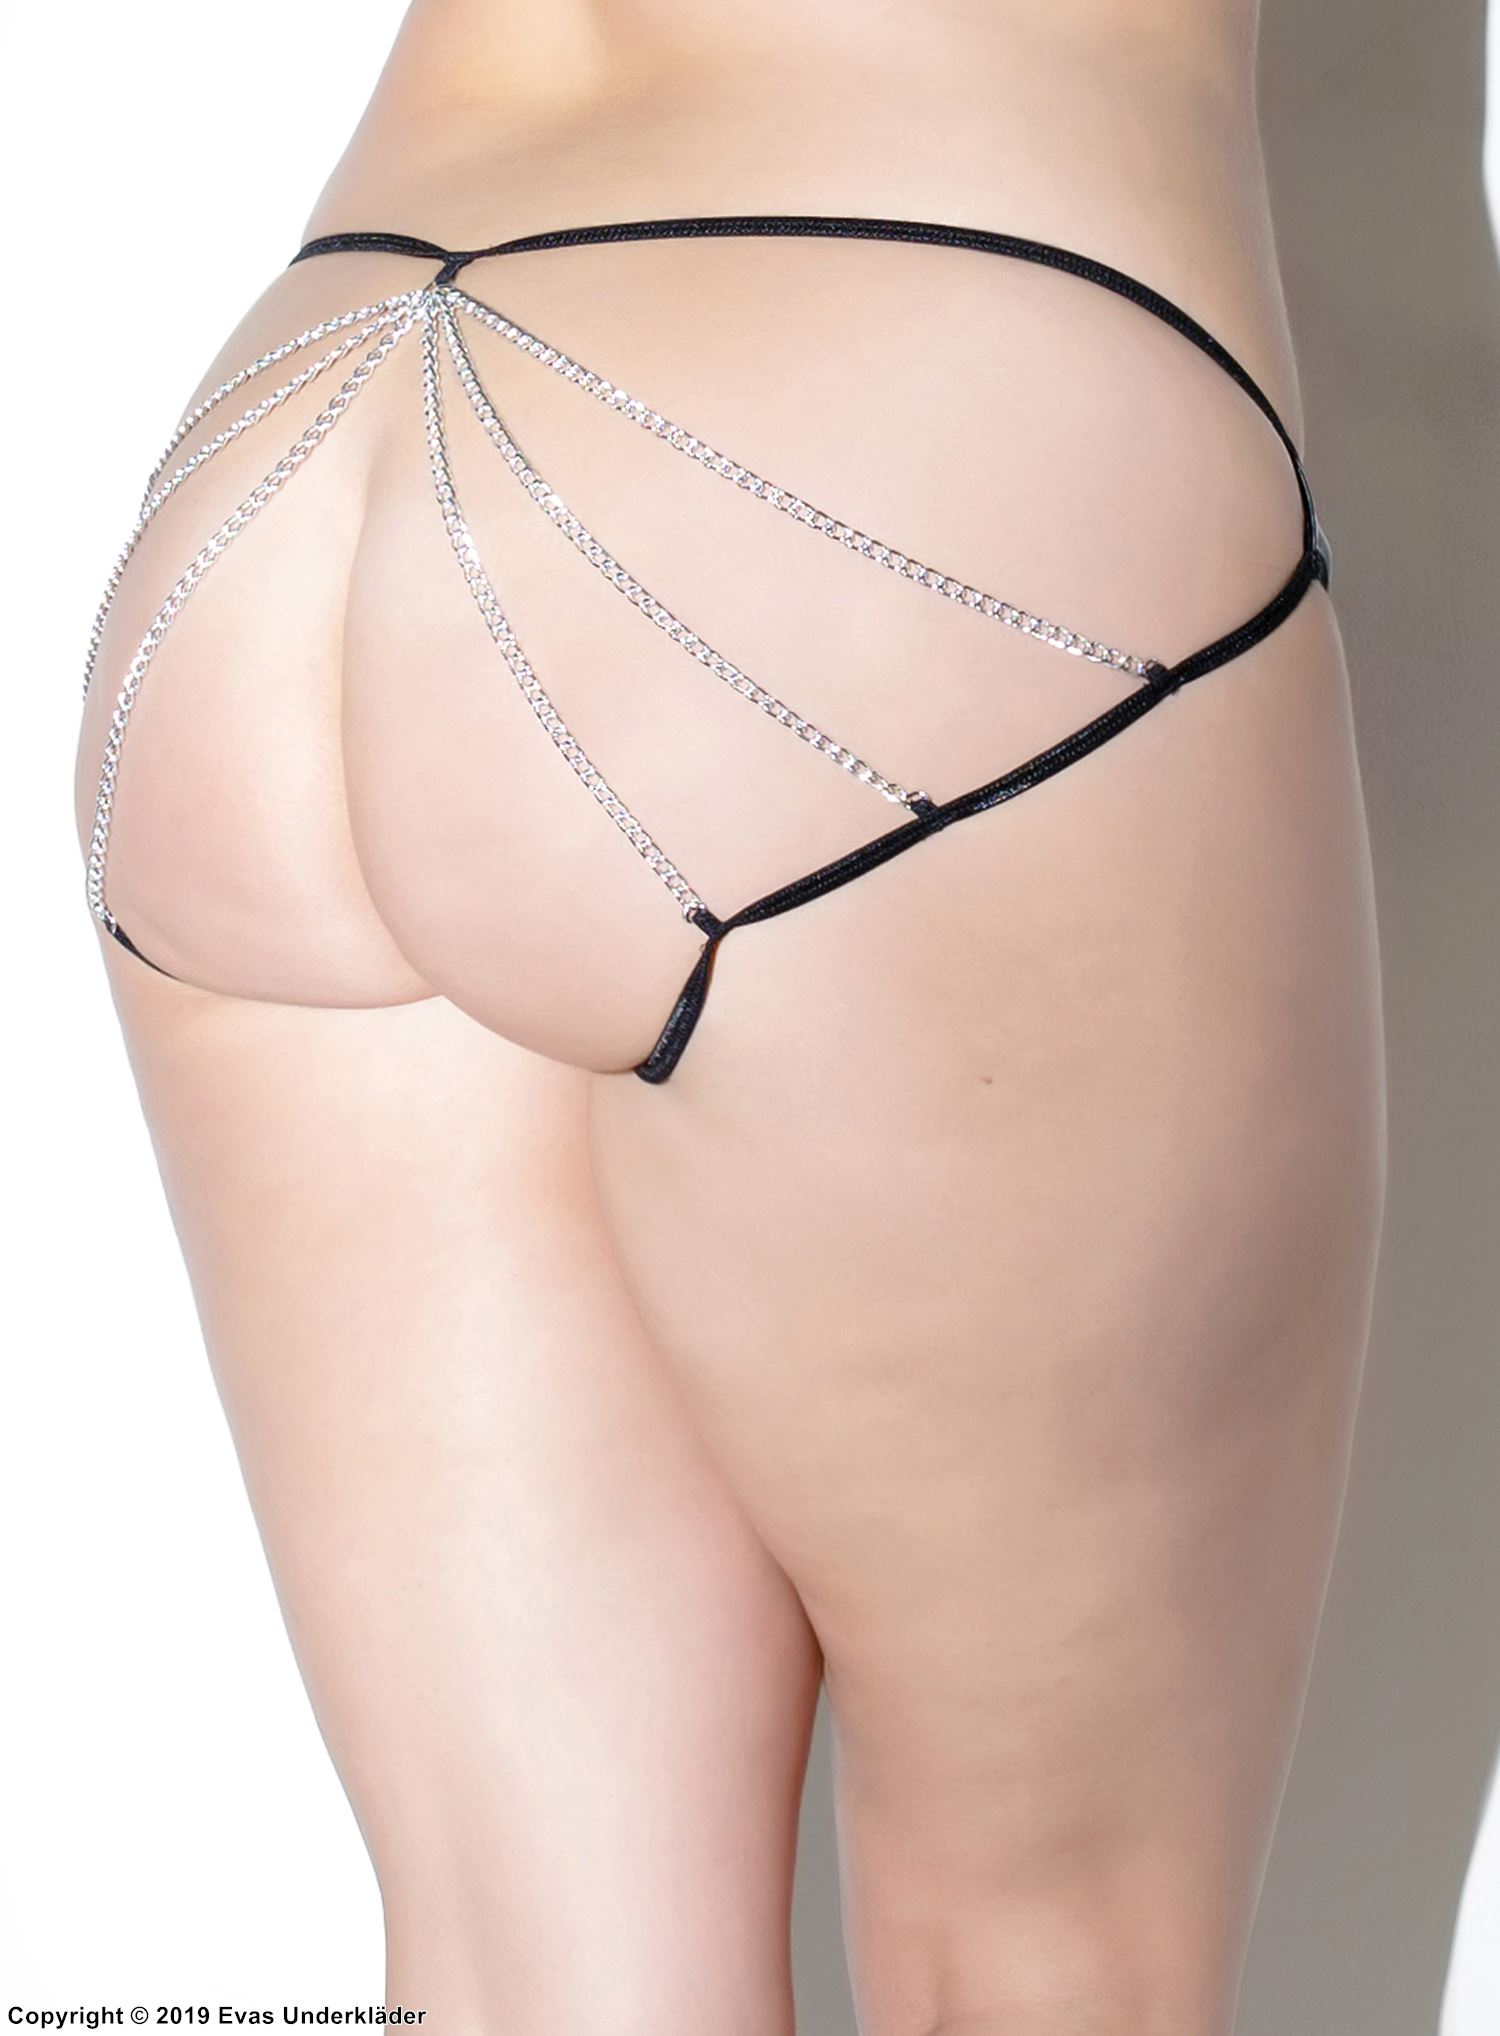 Take A Look Panties Revealing